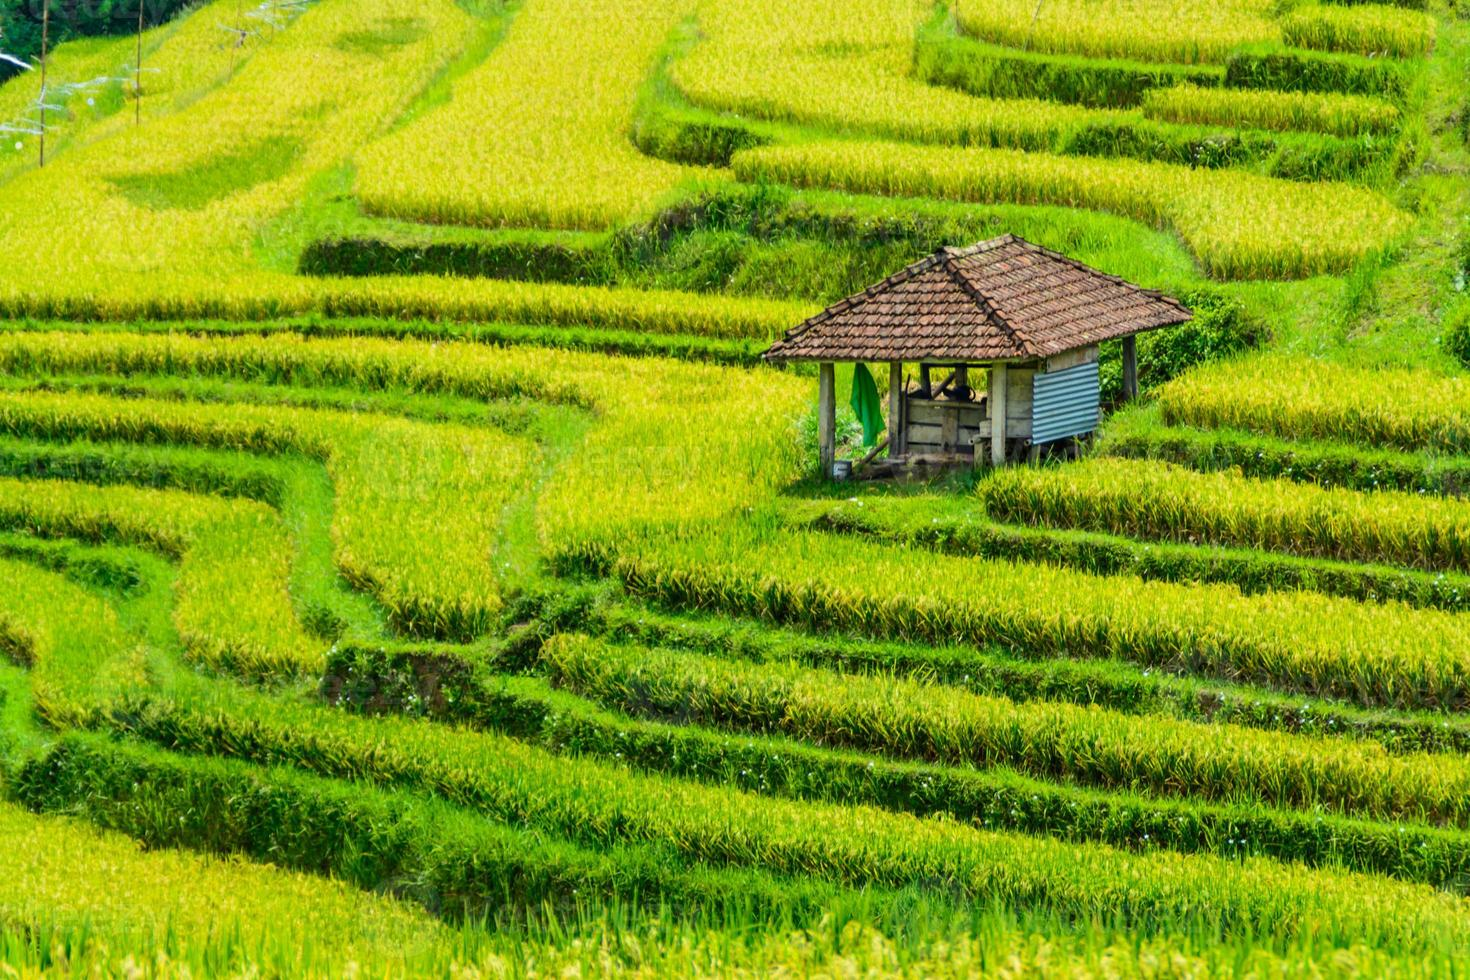 terrasse de riz en escalier photo